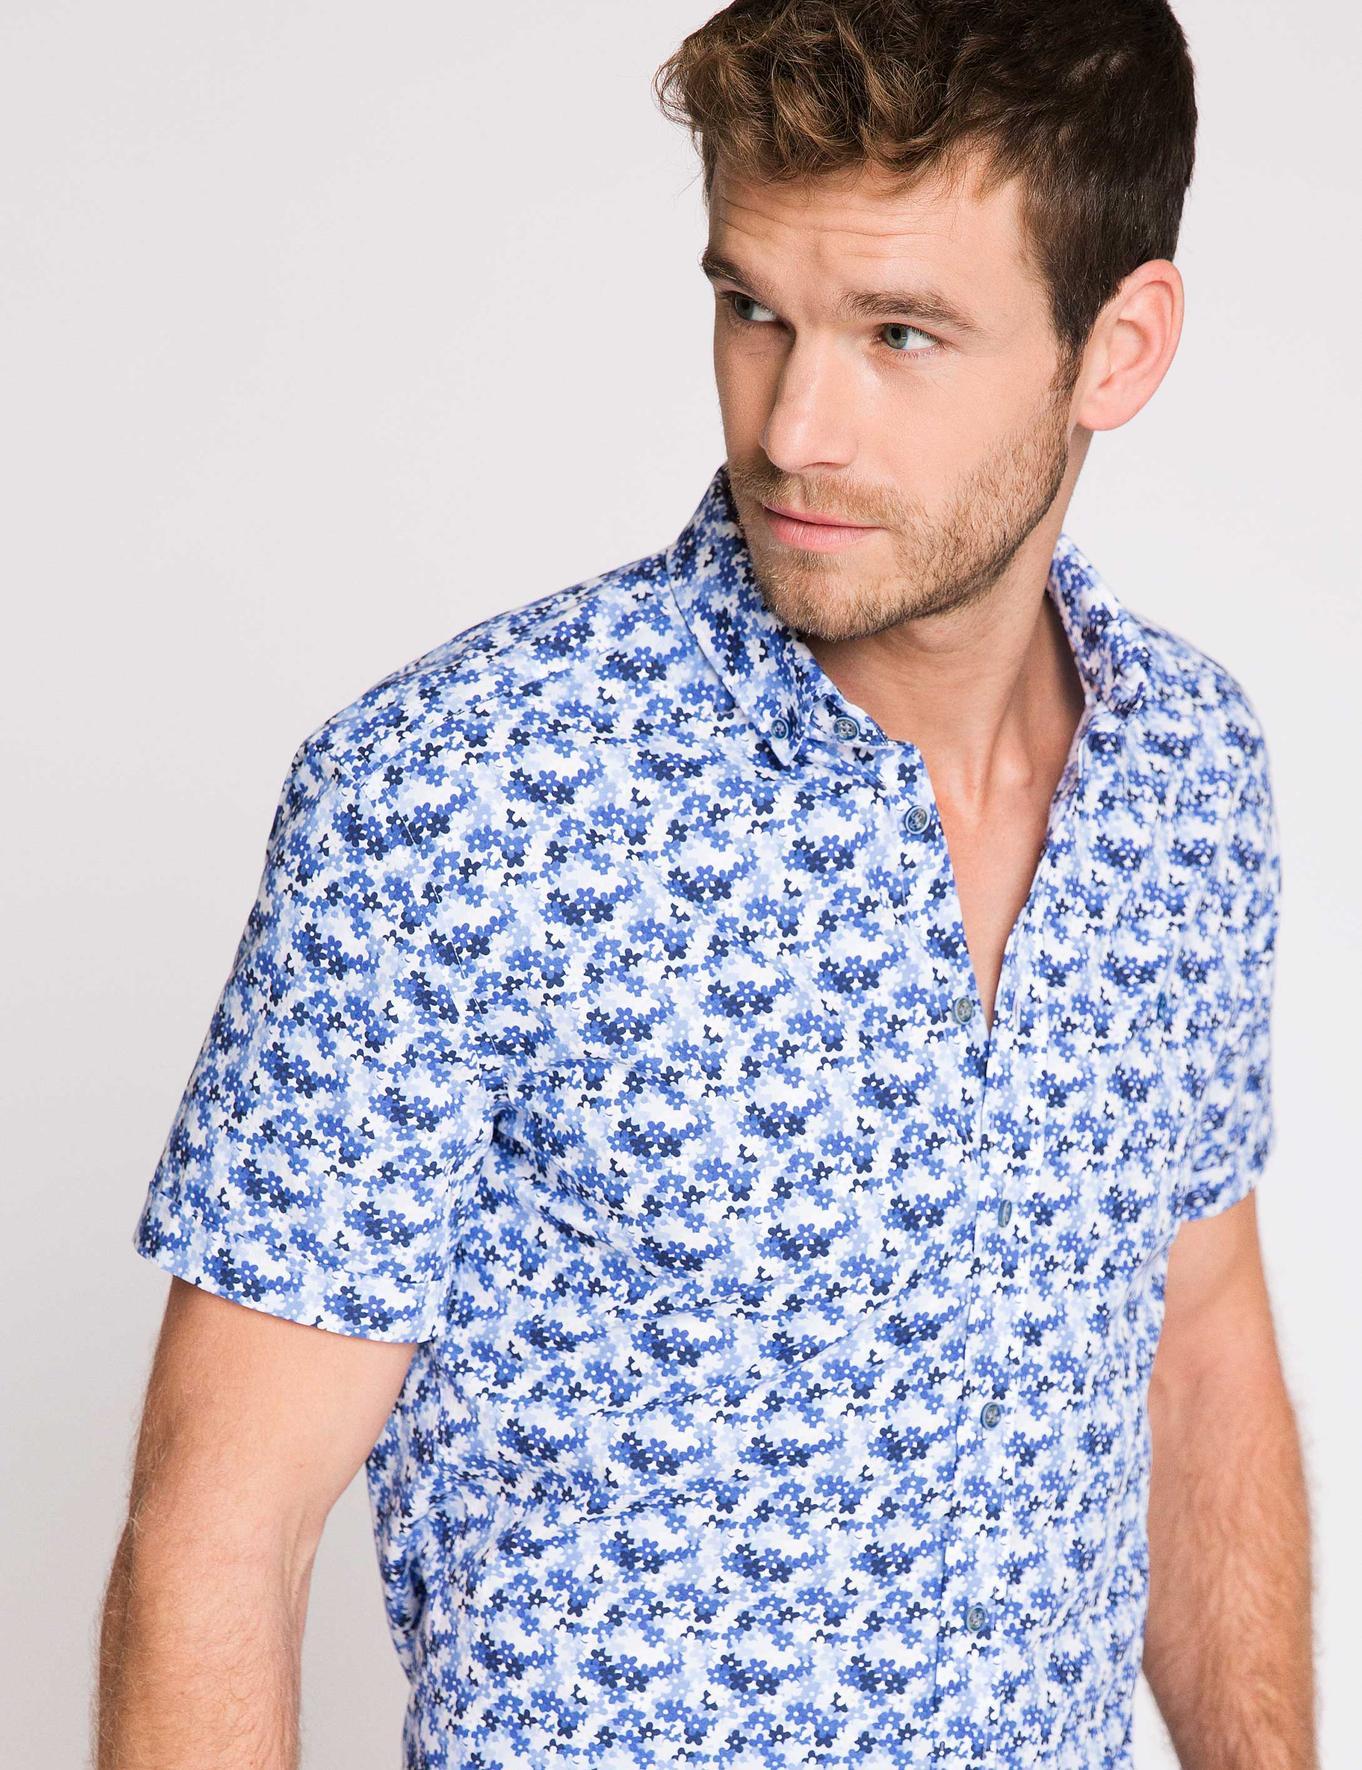 Mavi Slim Fit Kısa Kollu Gömlek